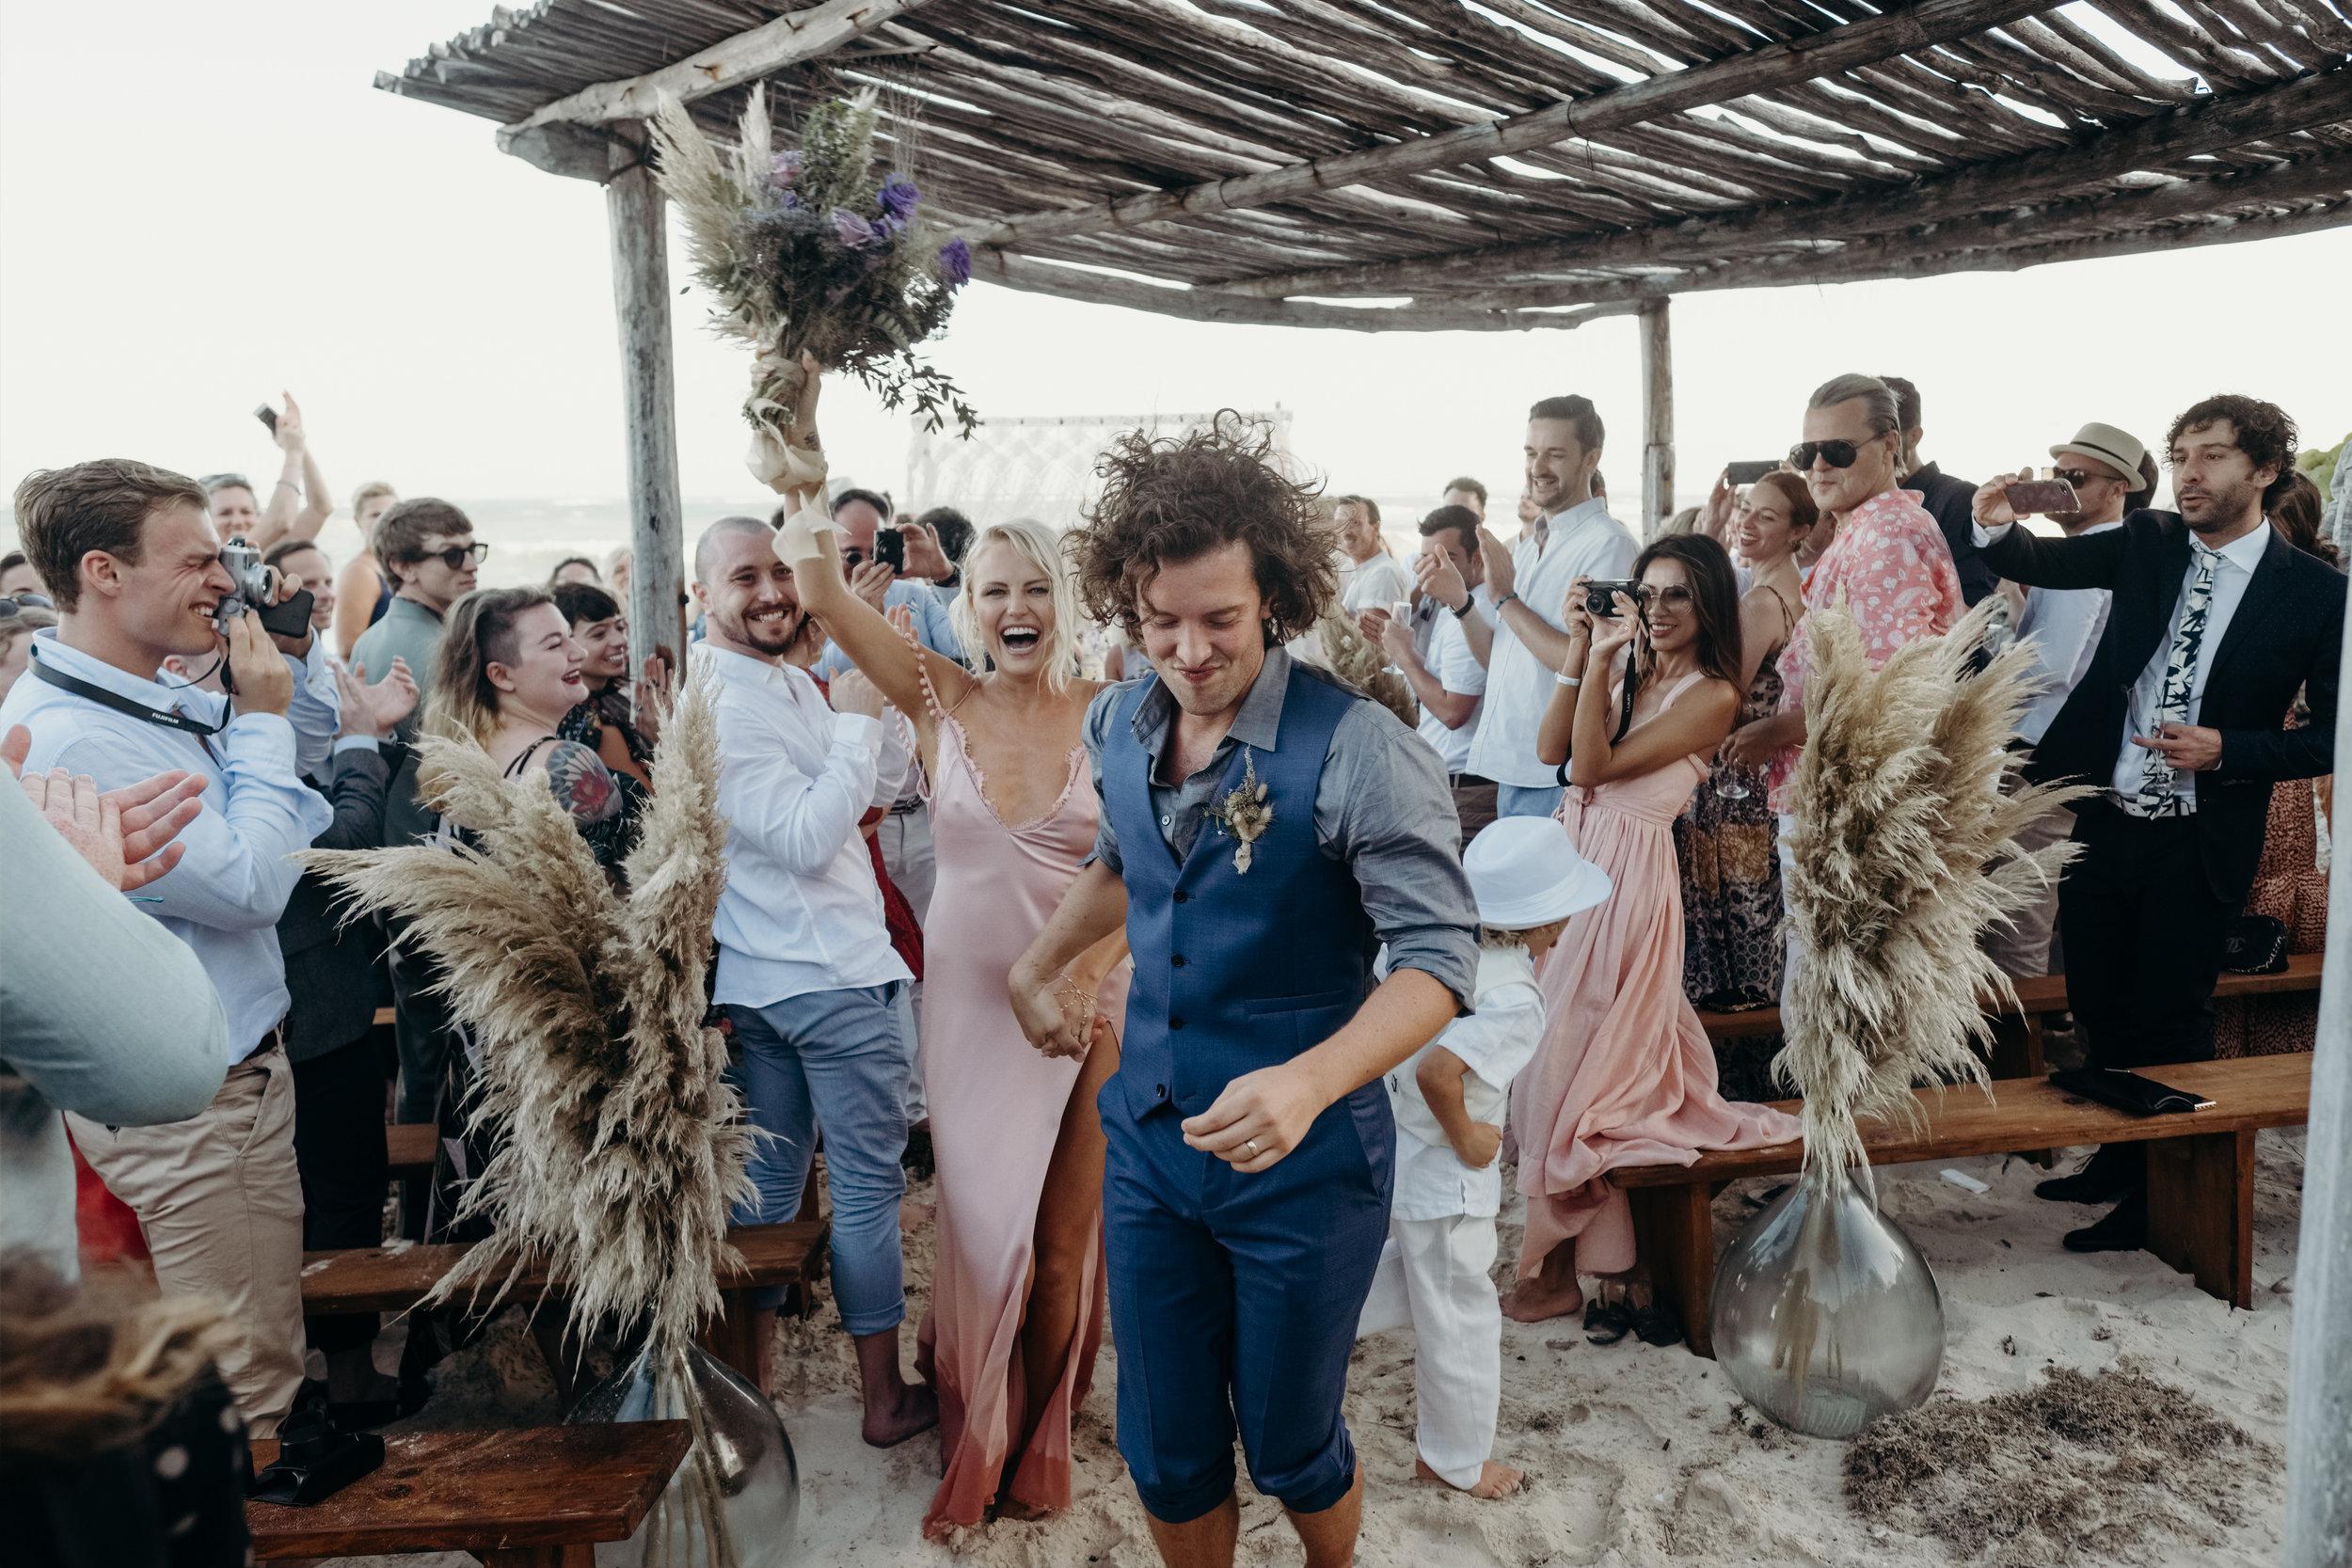 Malin-Akerman-Wedding-Tulum-Andrea-Freeman-Events-12.JPG